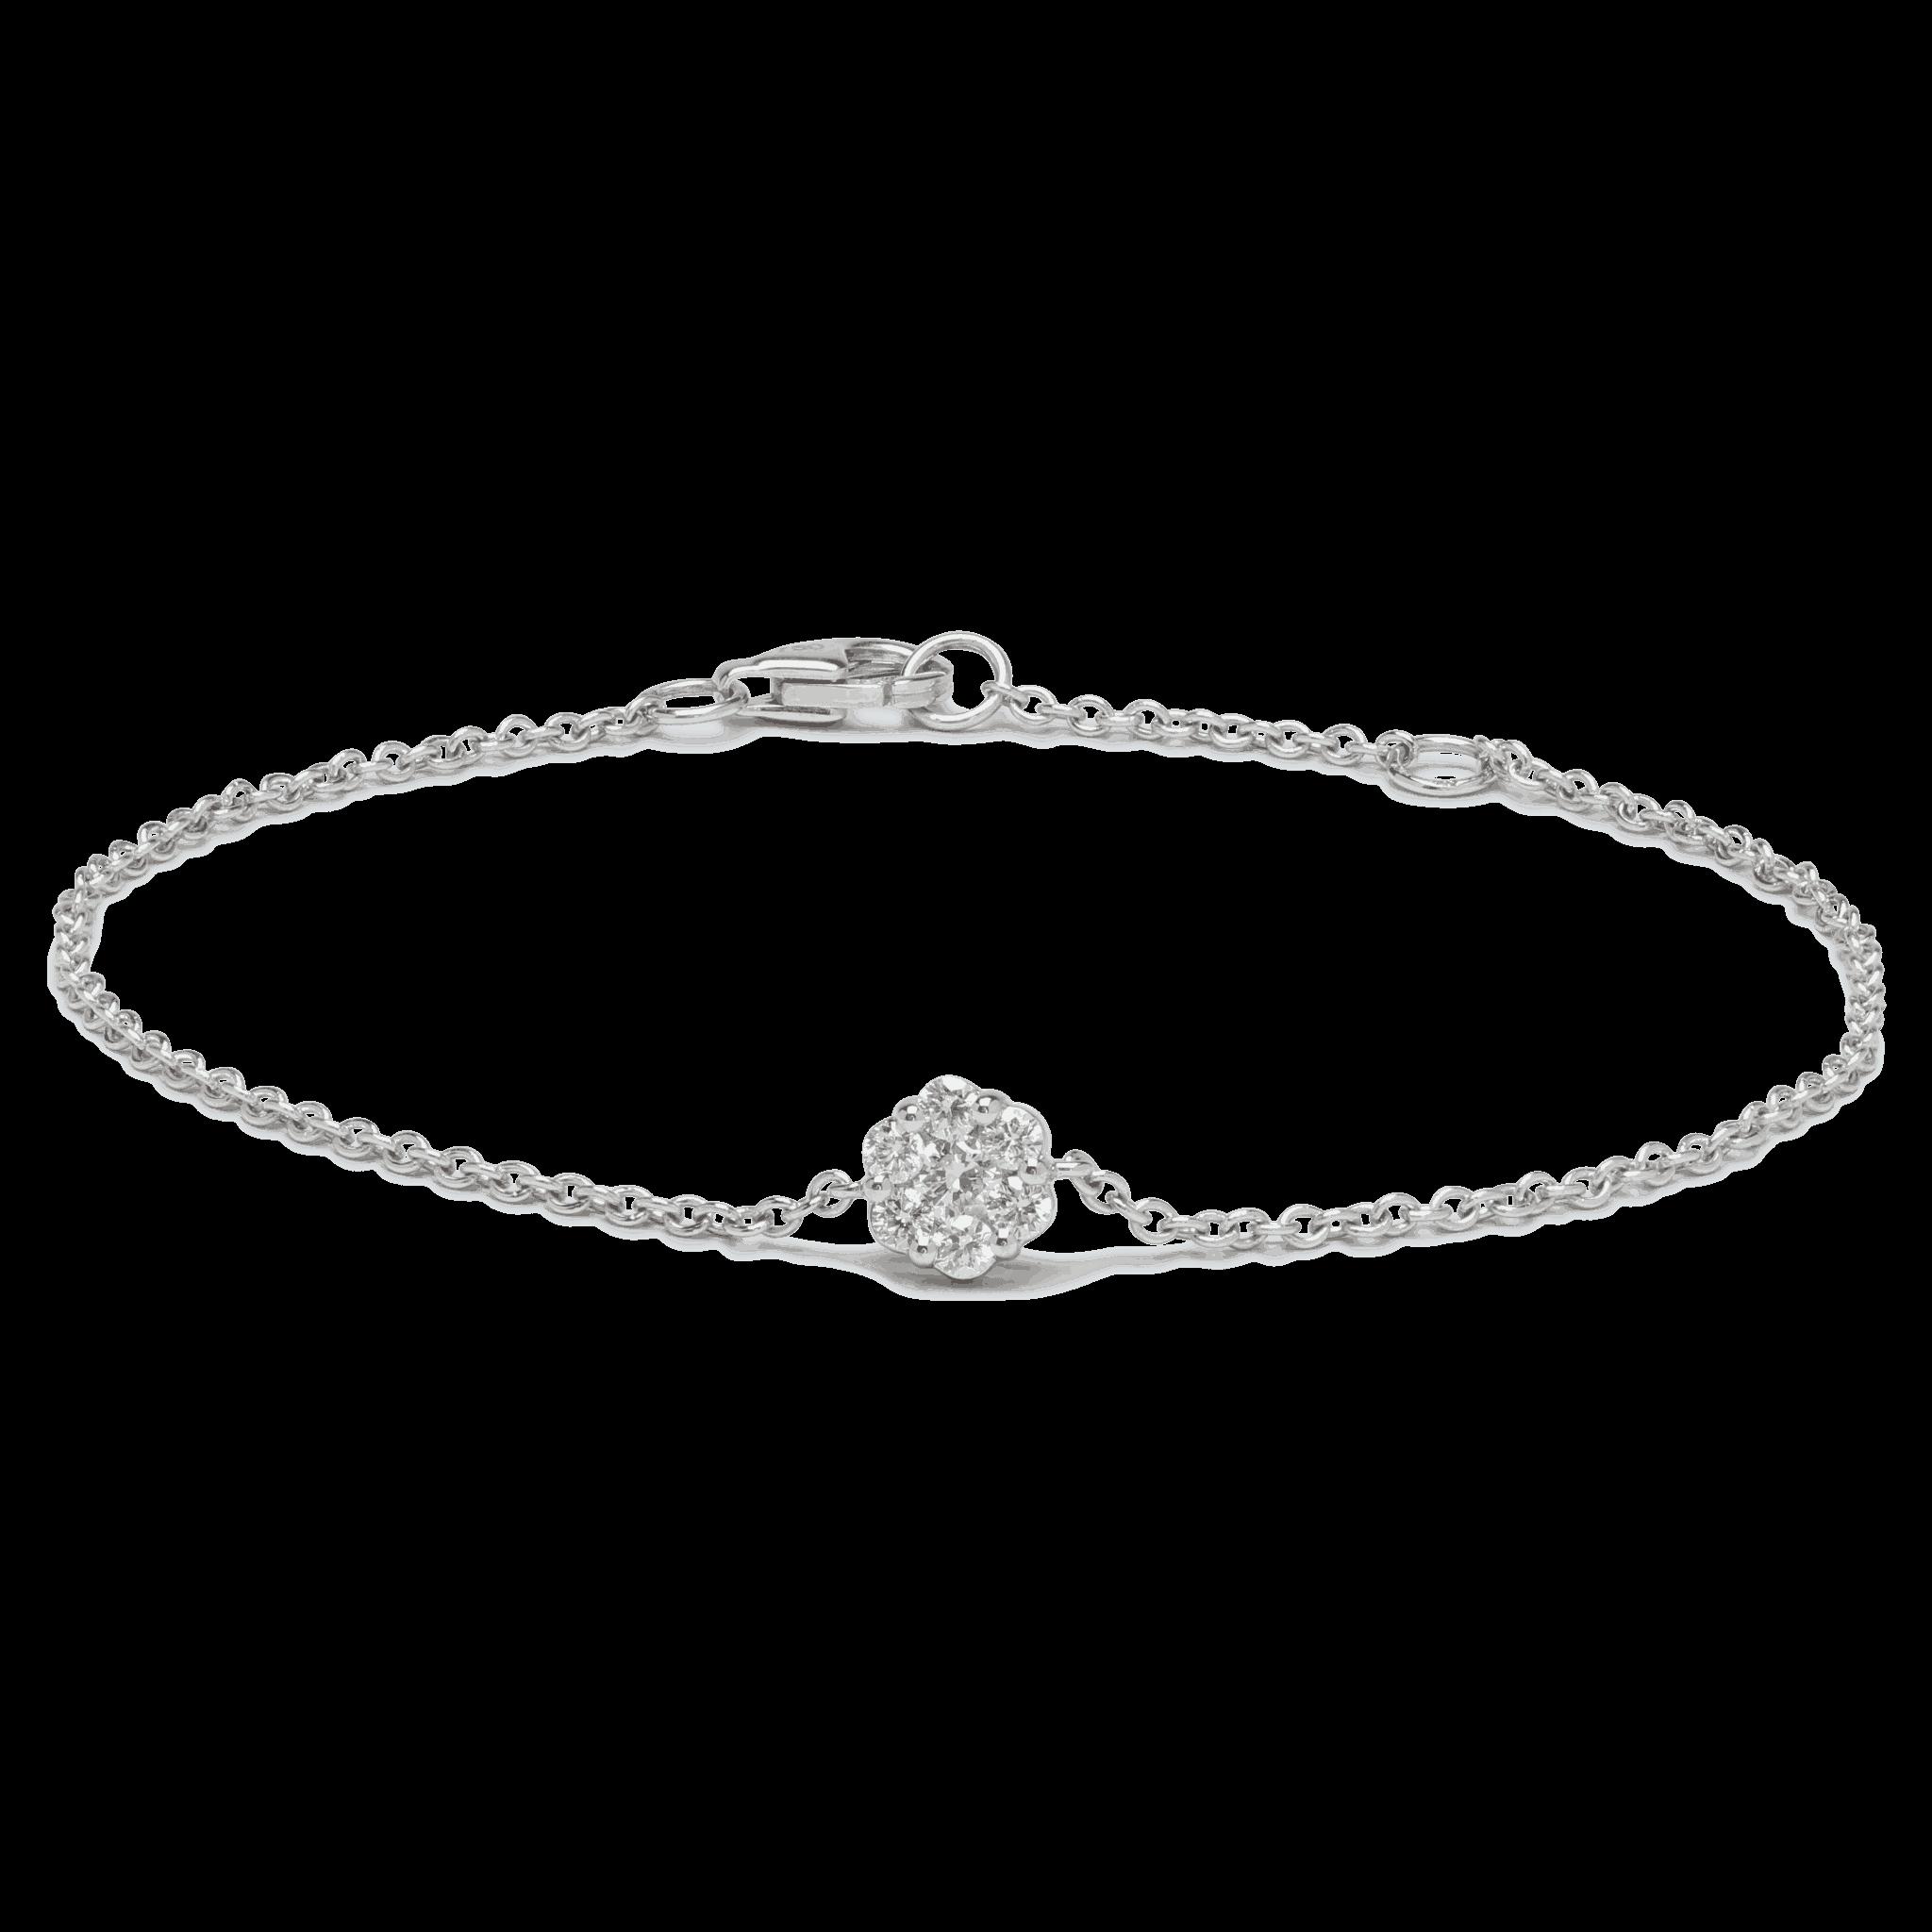 25709 - 18ct White Gold Diamond Bracelet